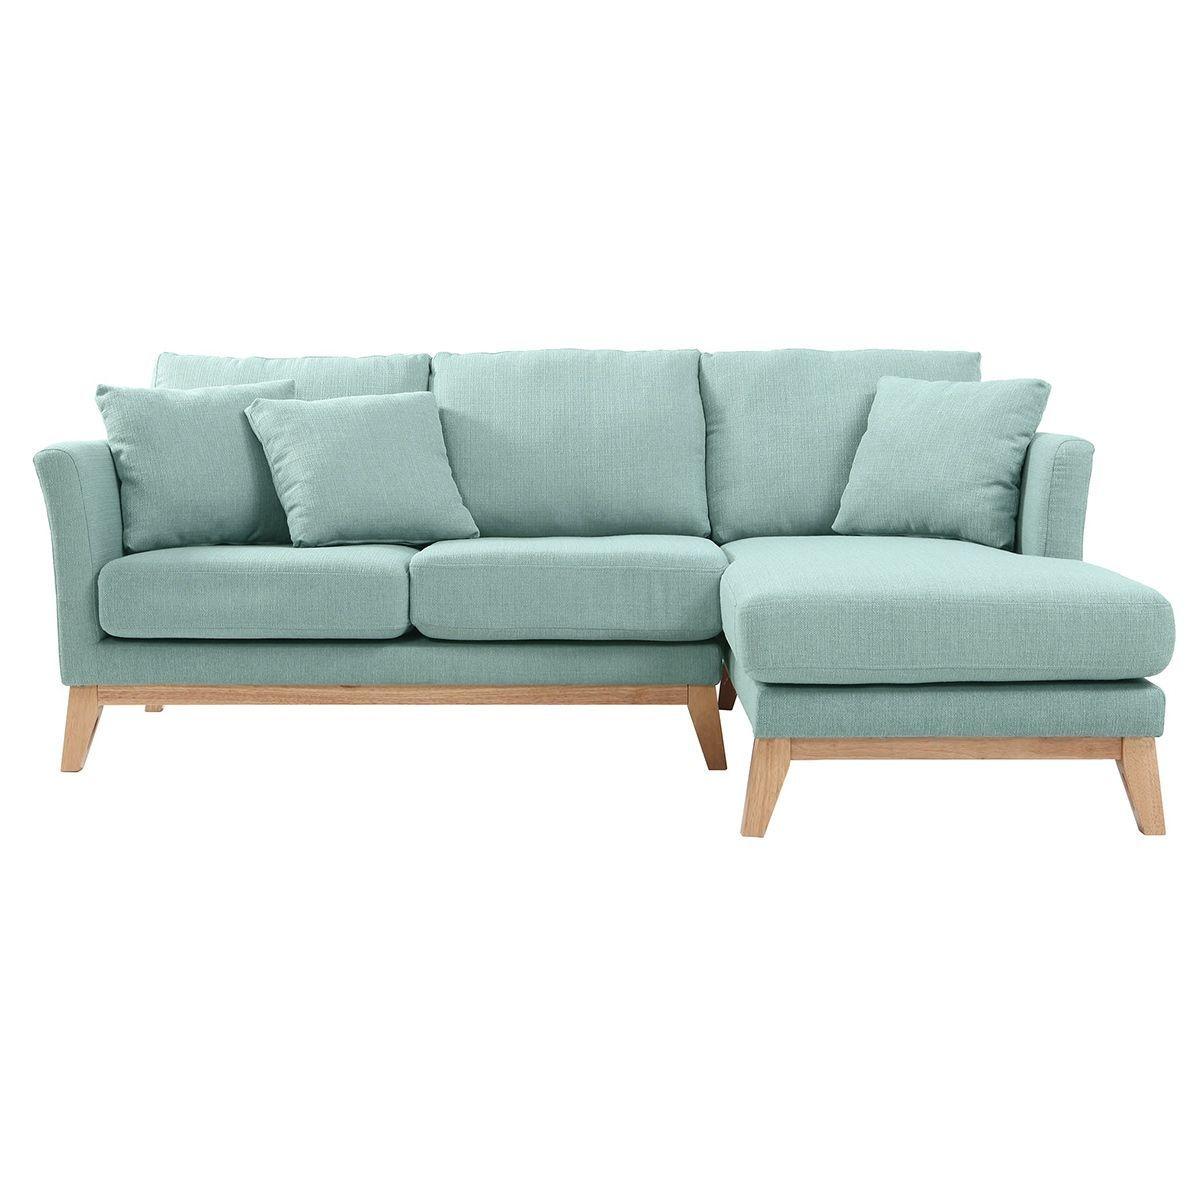 Canapé d'angle amovible OSLO